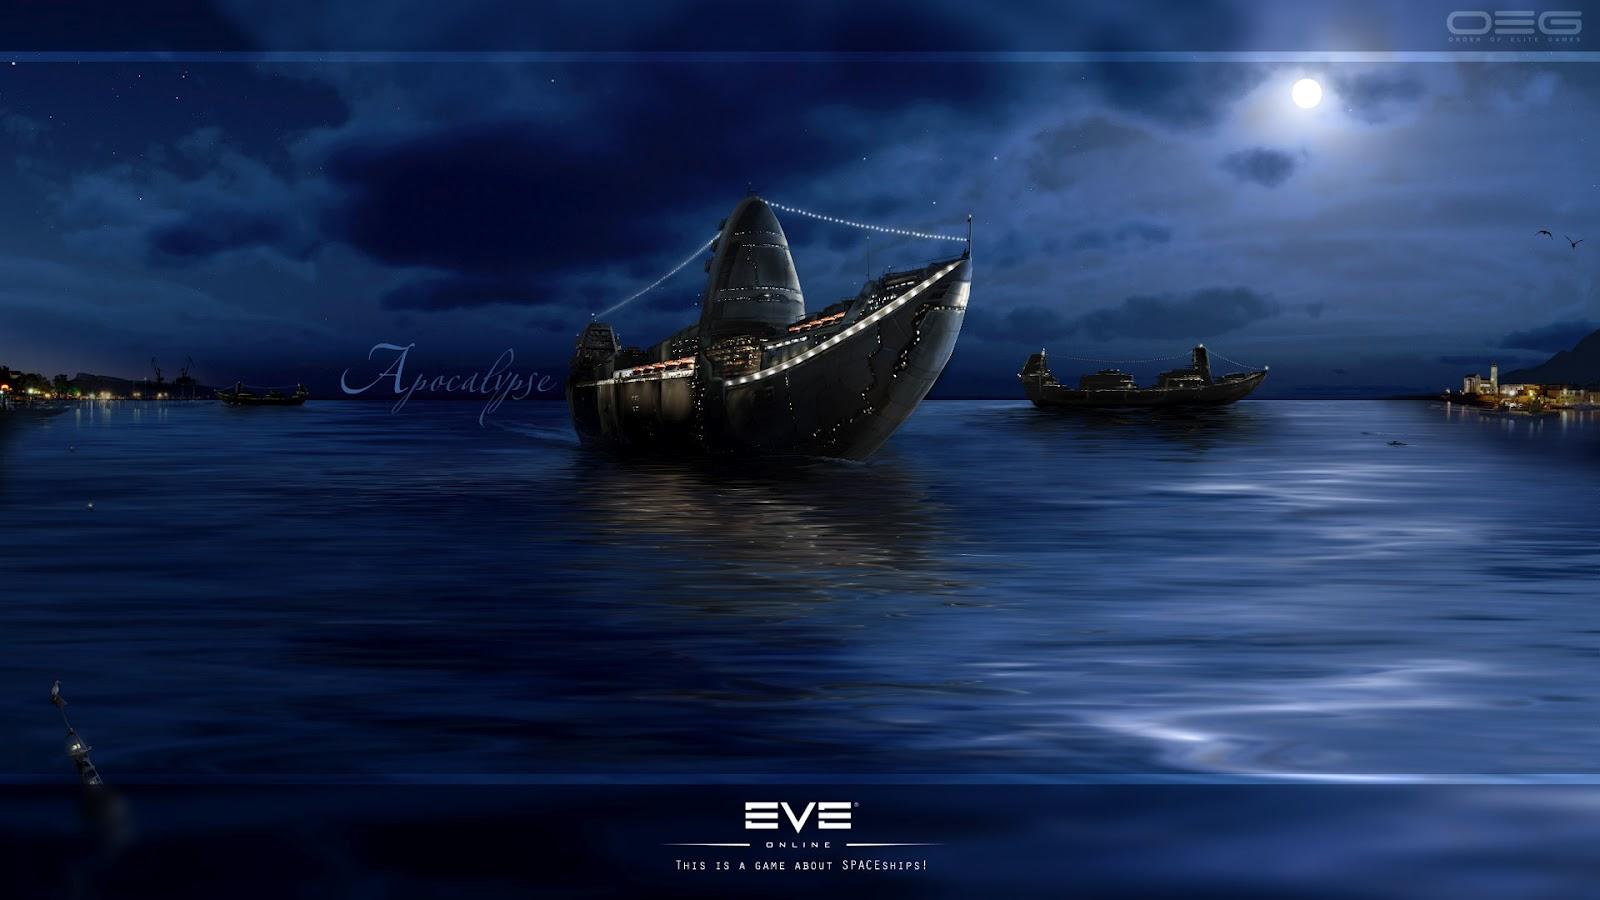 EVEOnlineWallpaper EVE Online Wallpaper in Ful HD 1080p 1600x900